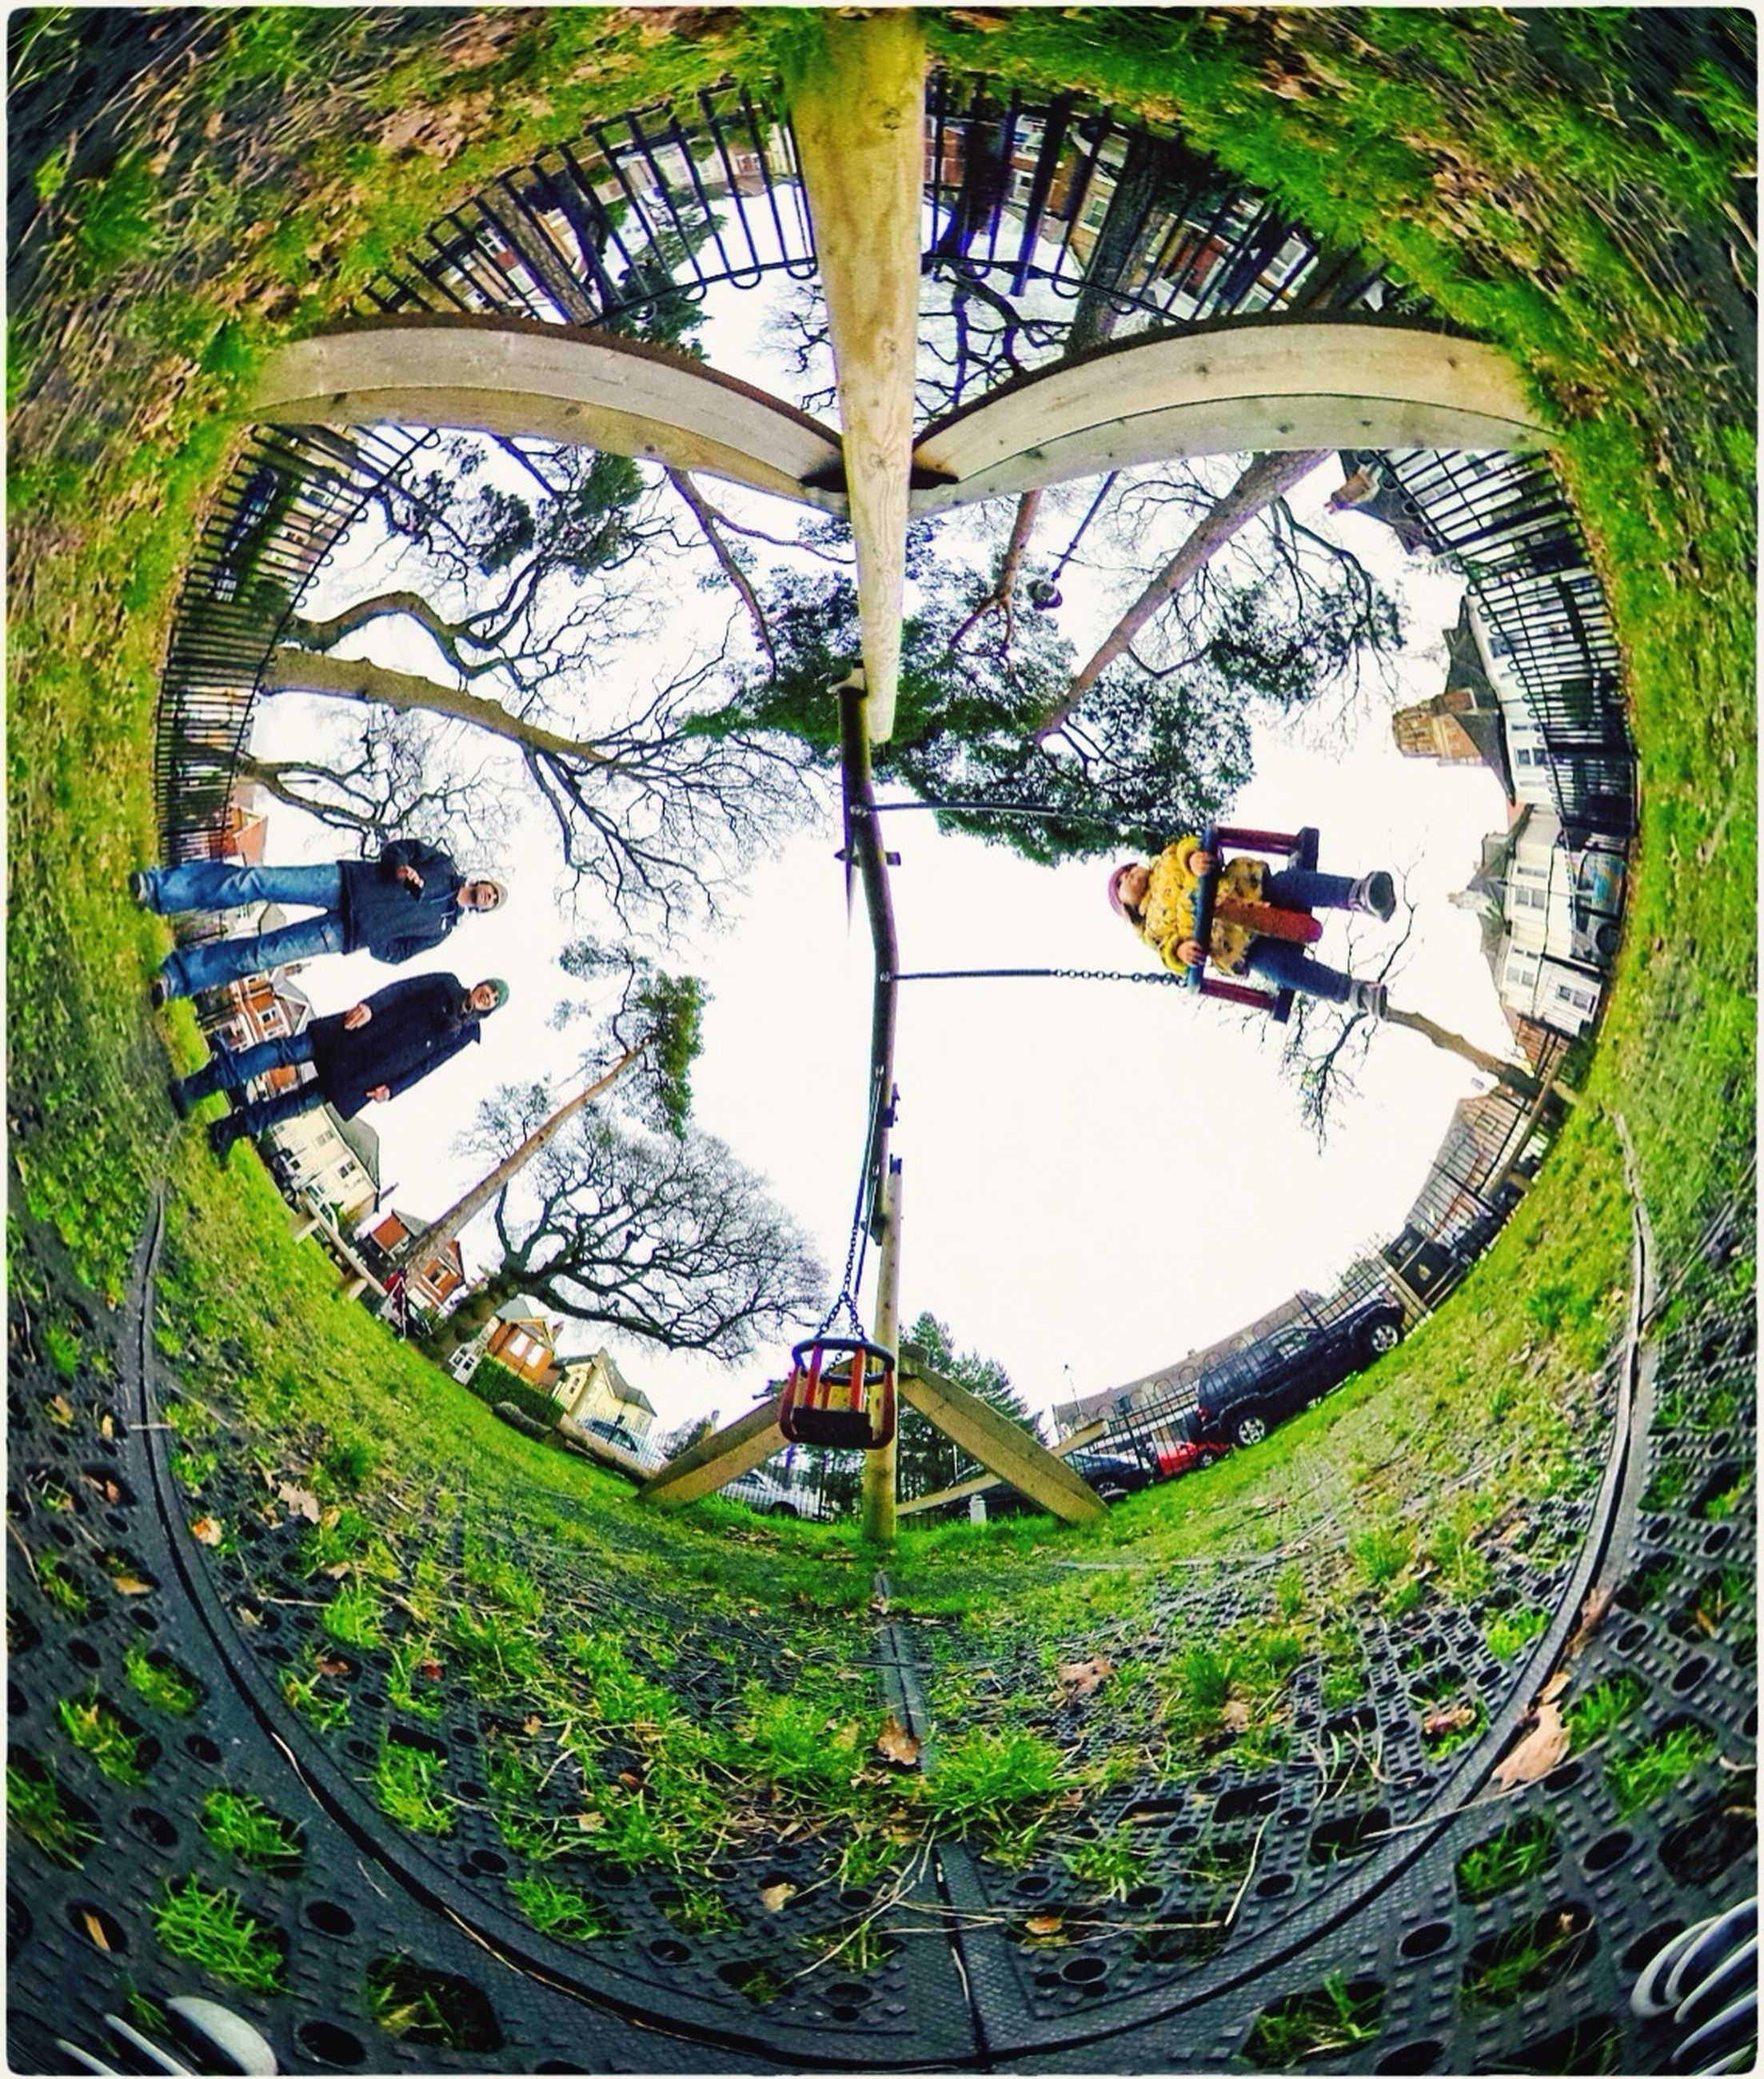 transfer print, leisure activity, circle, lifestyles, auto post production filter, bicycle, men, grass, amusement park, day, wheel, plant, field, green color, geometric shape, outdoors, tree, amusement park ride